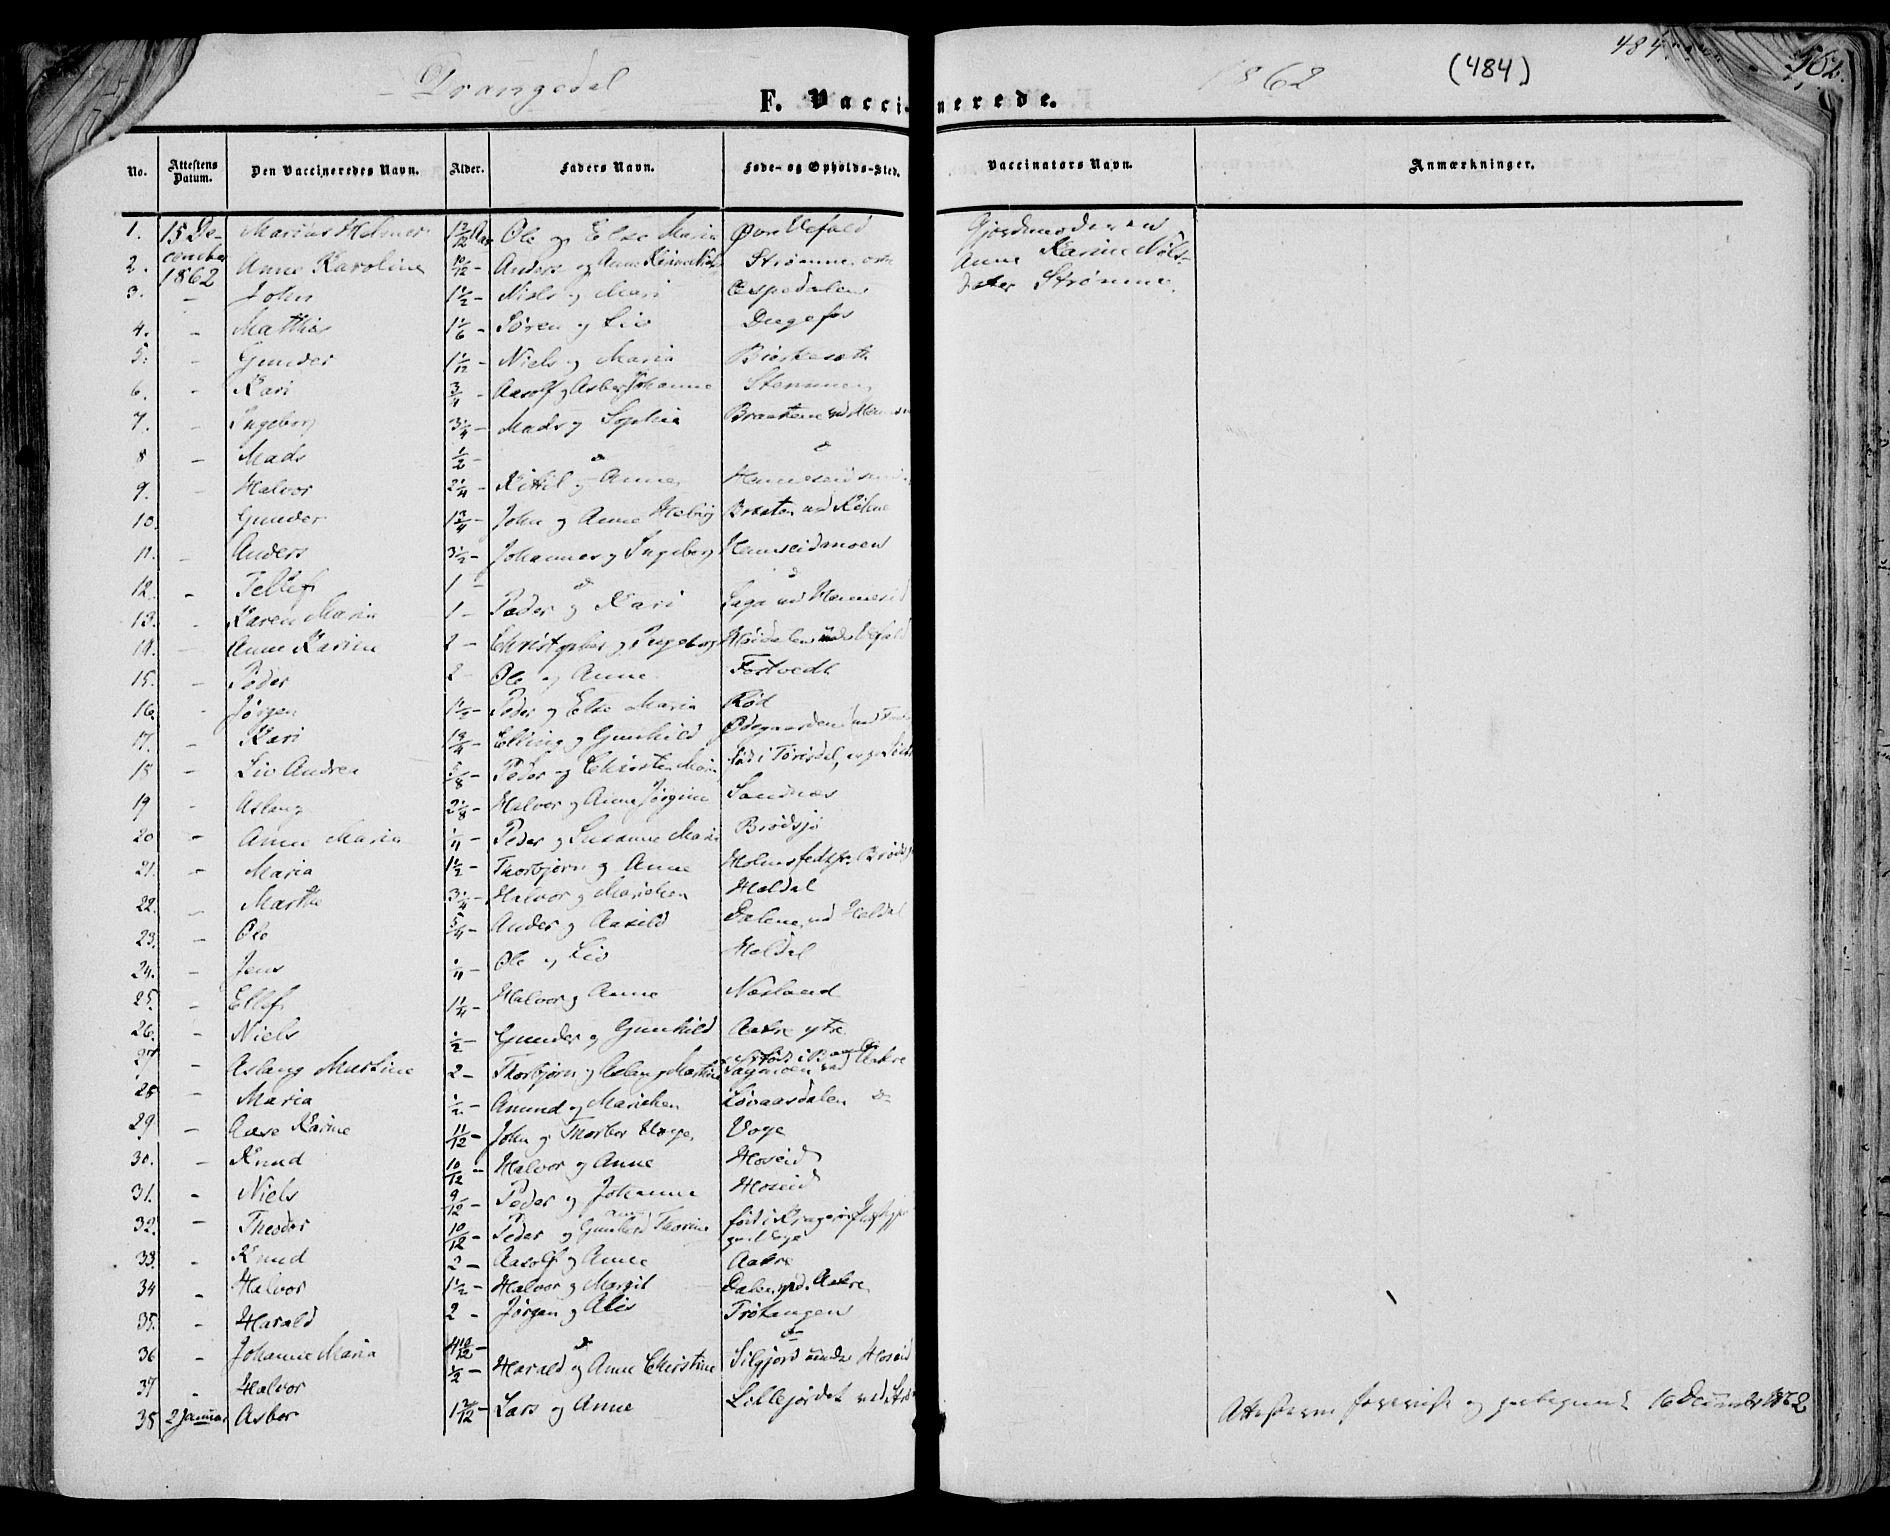 SAKO, Drangedal kirkebøker, F/Fa/L0008: Ministerialbok nr. 8, 1857-1871, s. 484